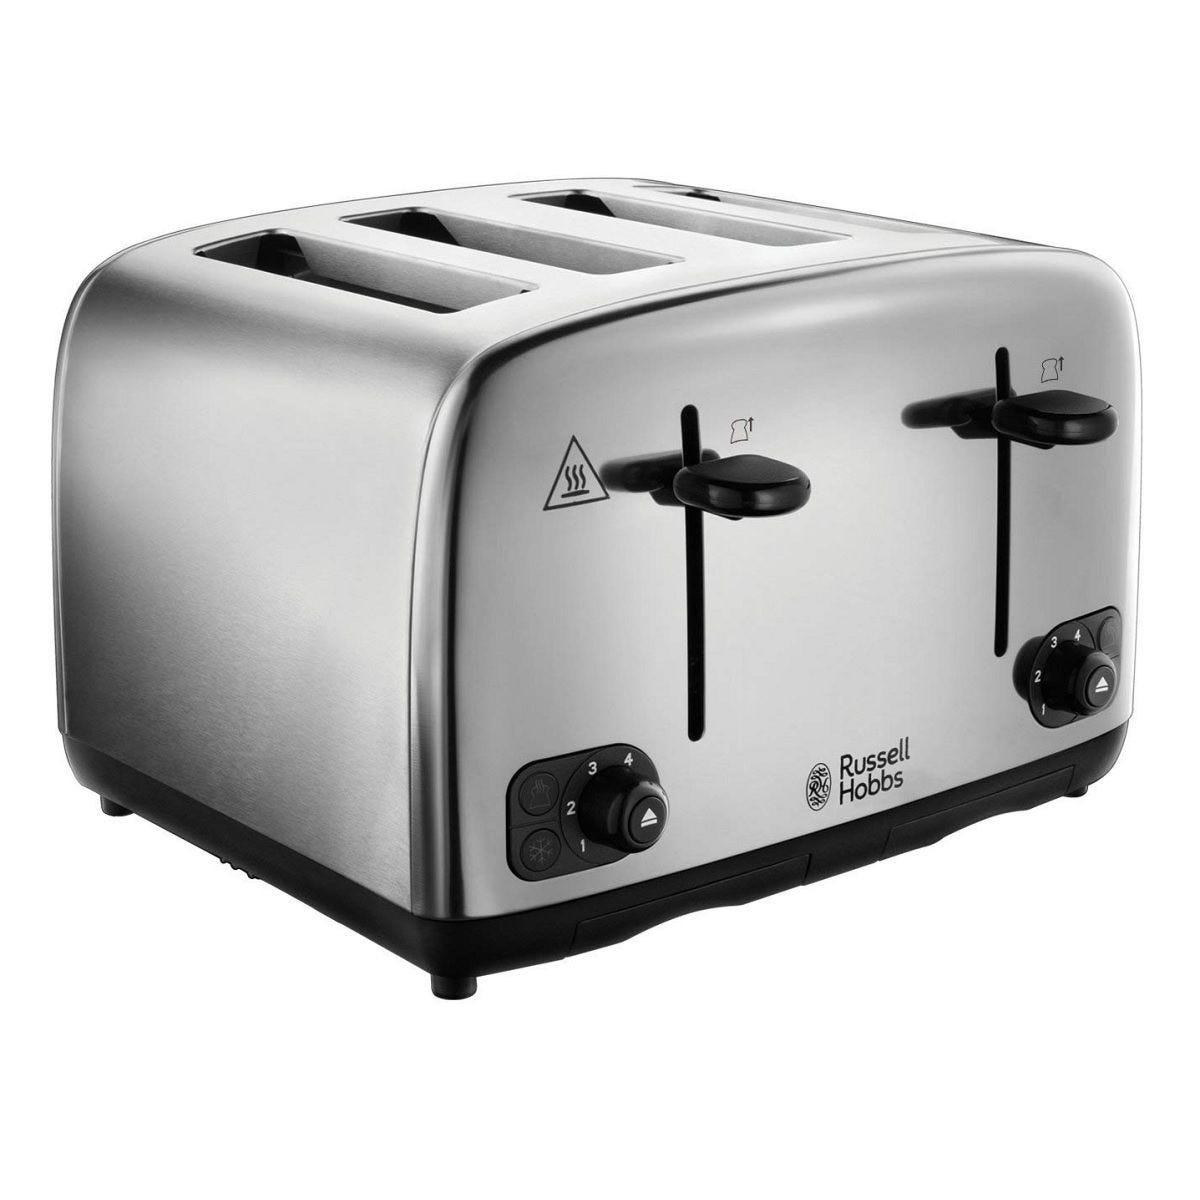 Russell Hobbs 24090 Toaster 4 Slice – Stainless Steel